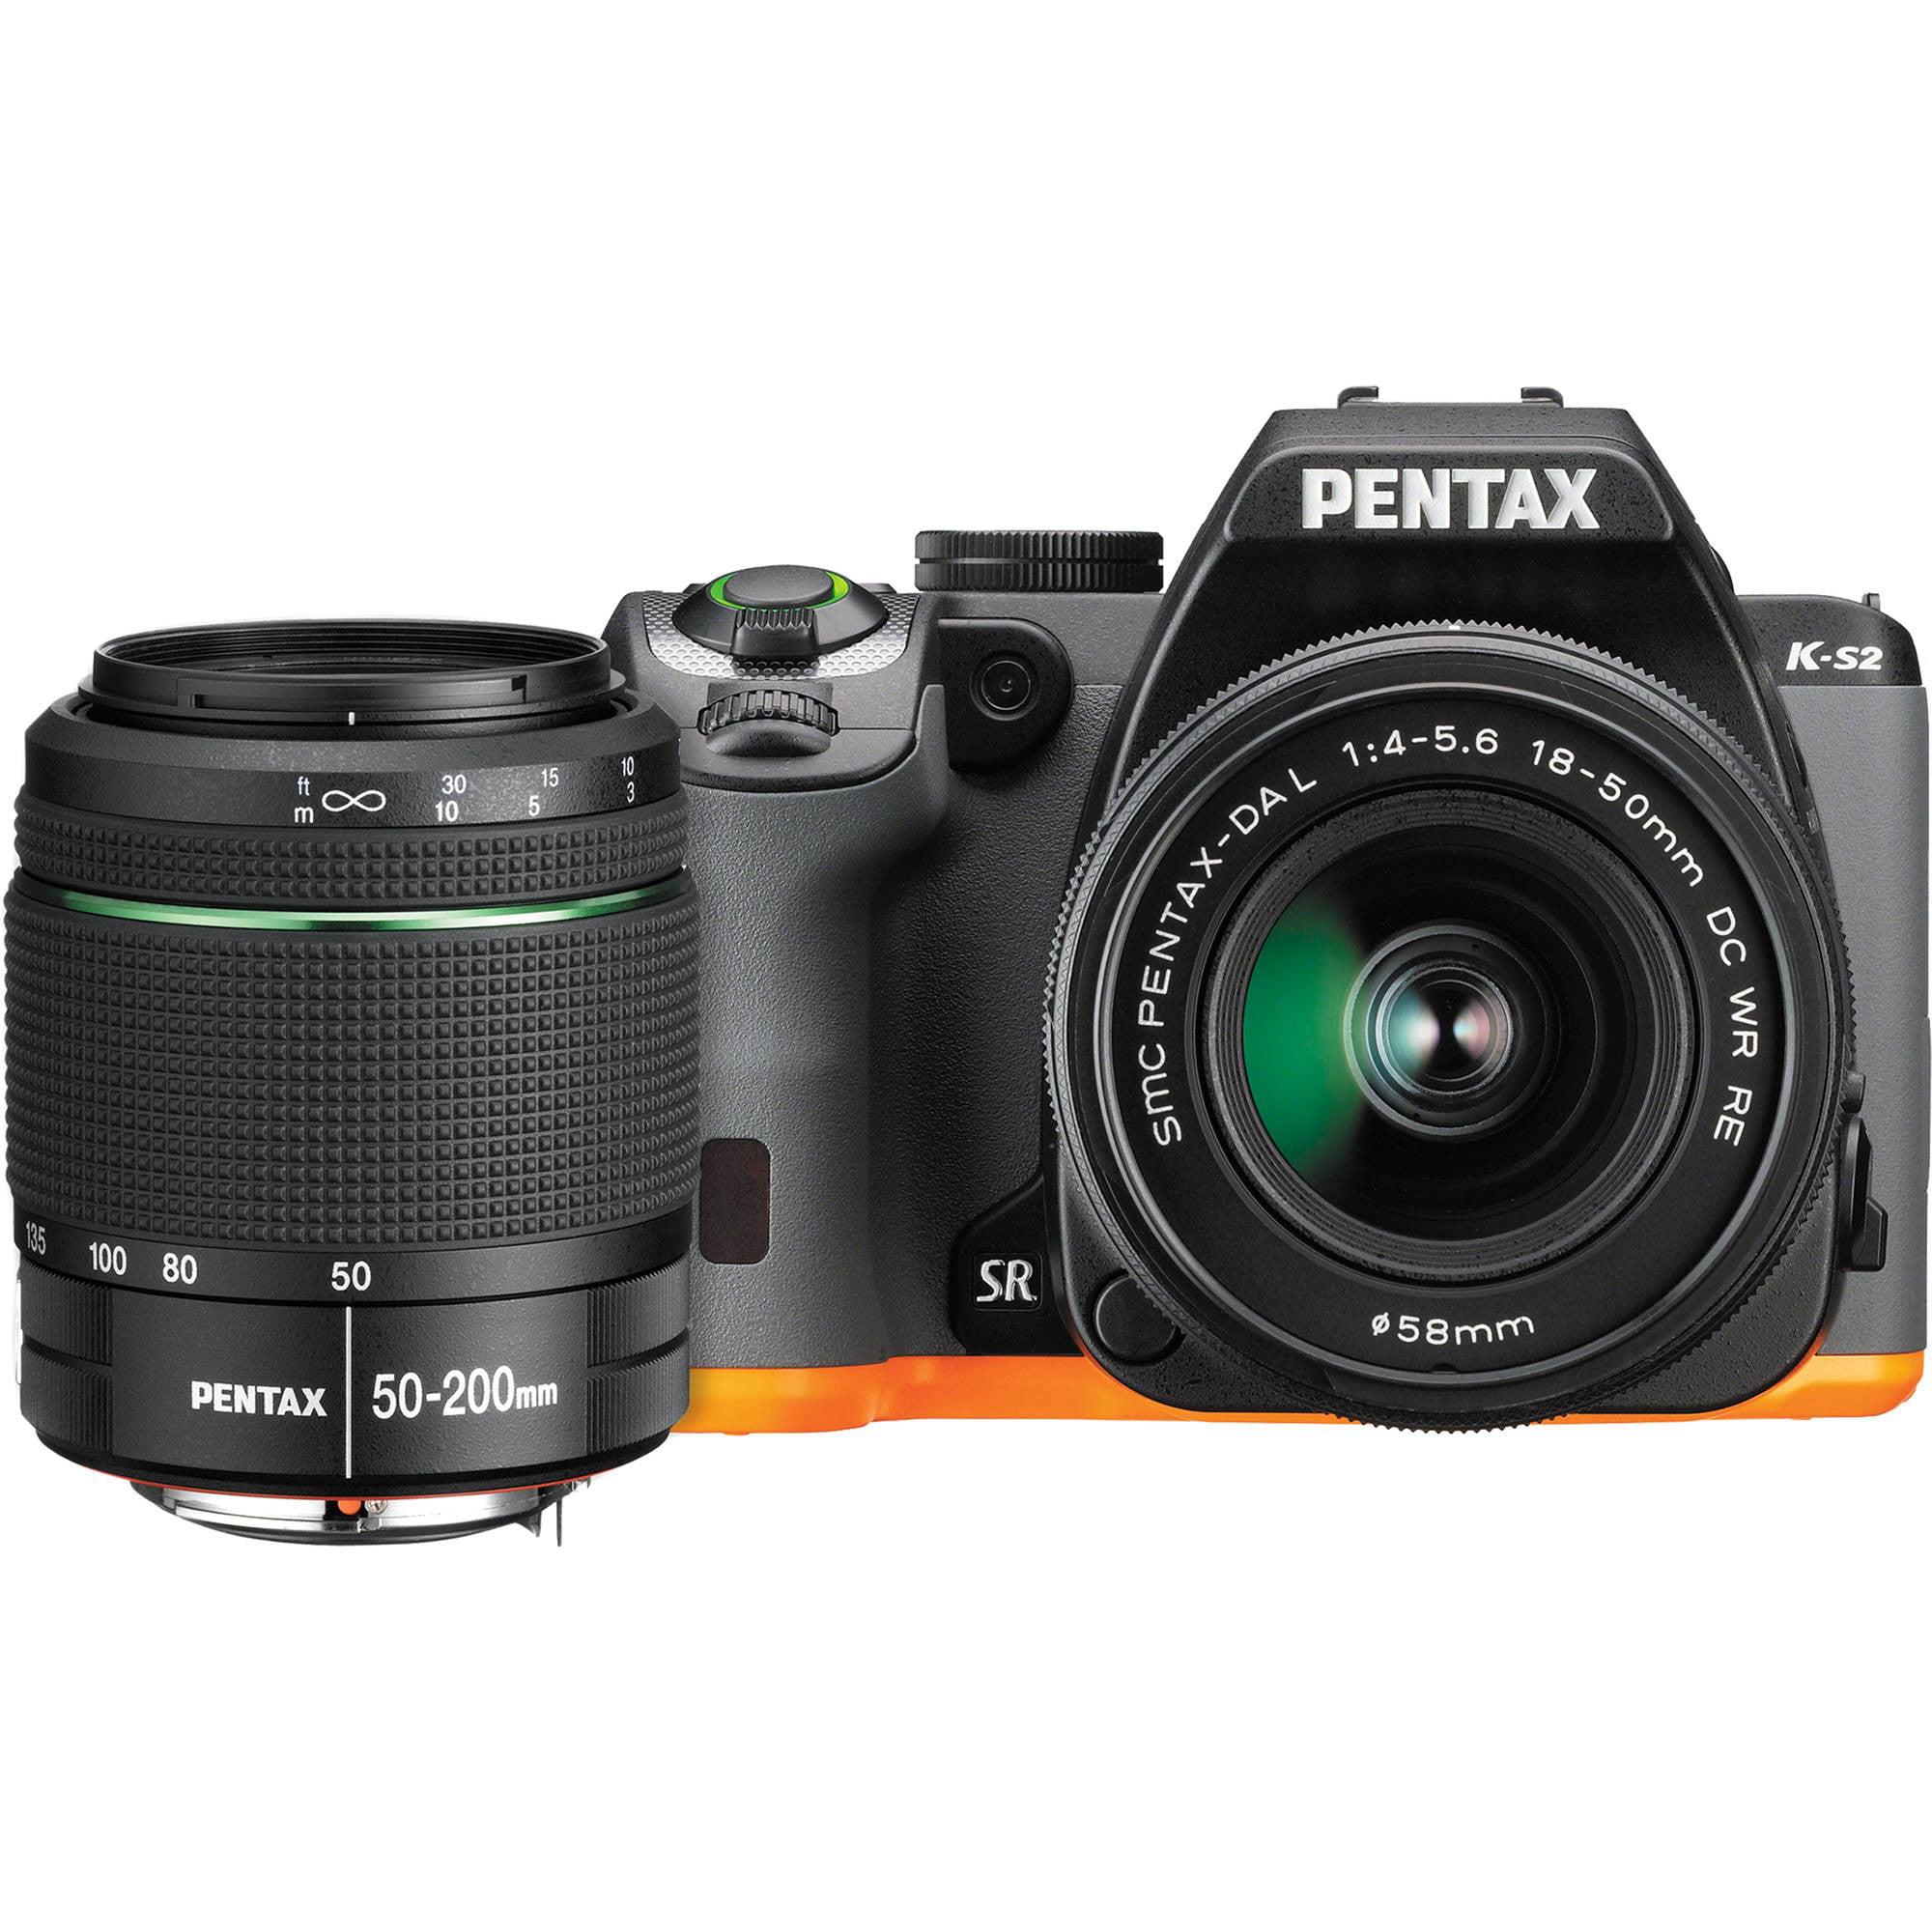 PENTAX 13218 20.0 Megapixel K-S2 Digital SLR Camera (WZoom; Black & Orange)